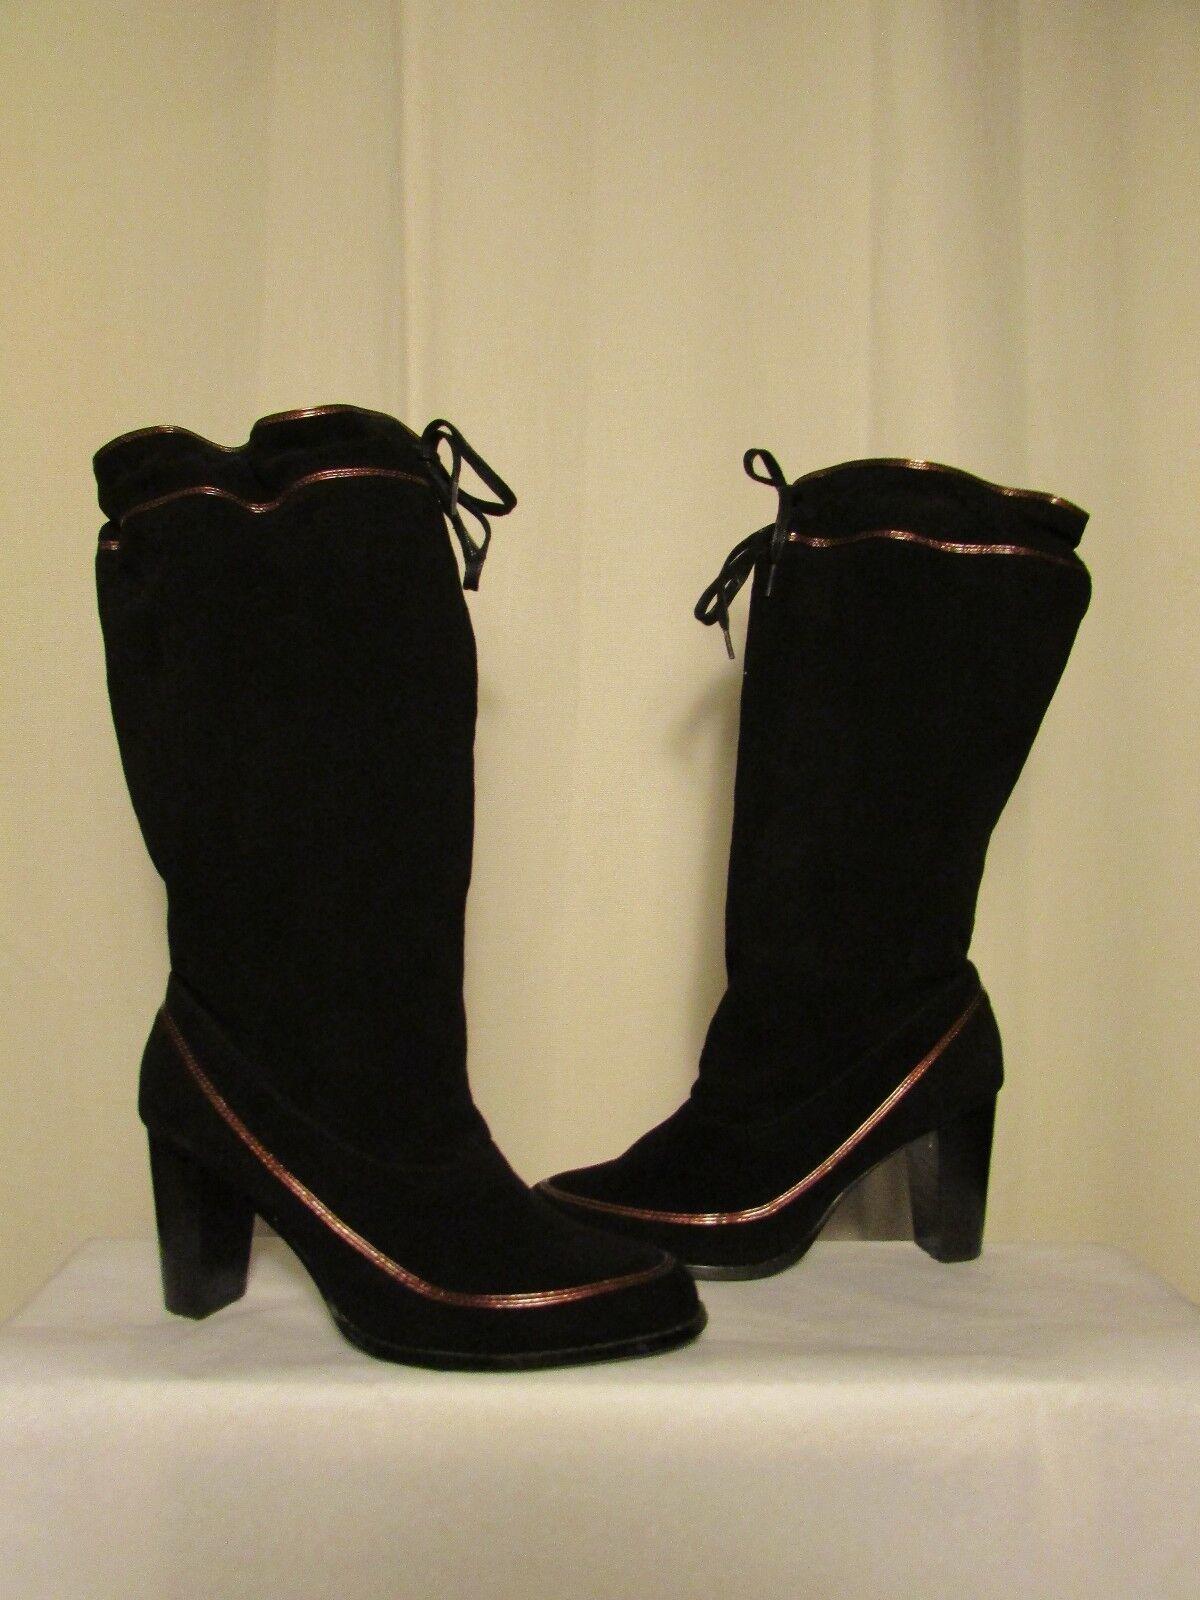 bottes MELLOW YELLOW daim noir noir daim 39 fcffc4